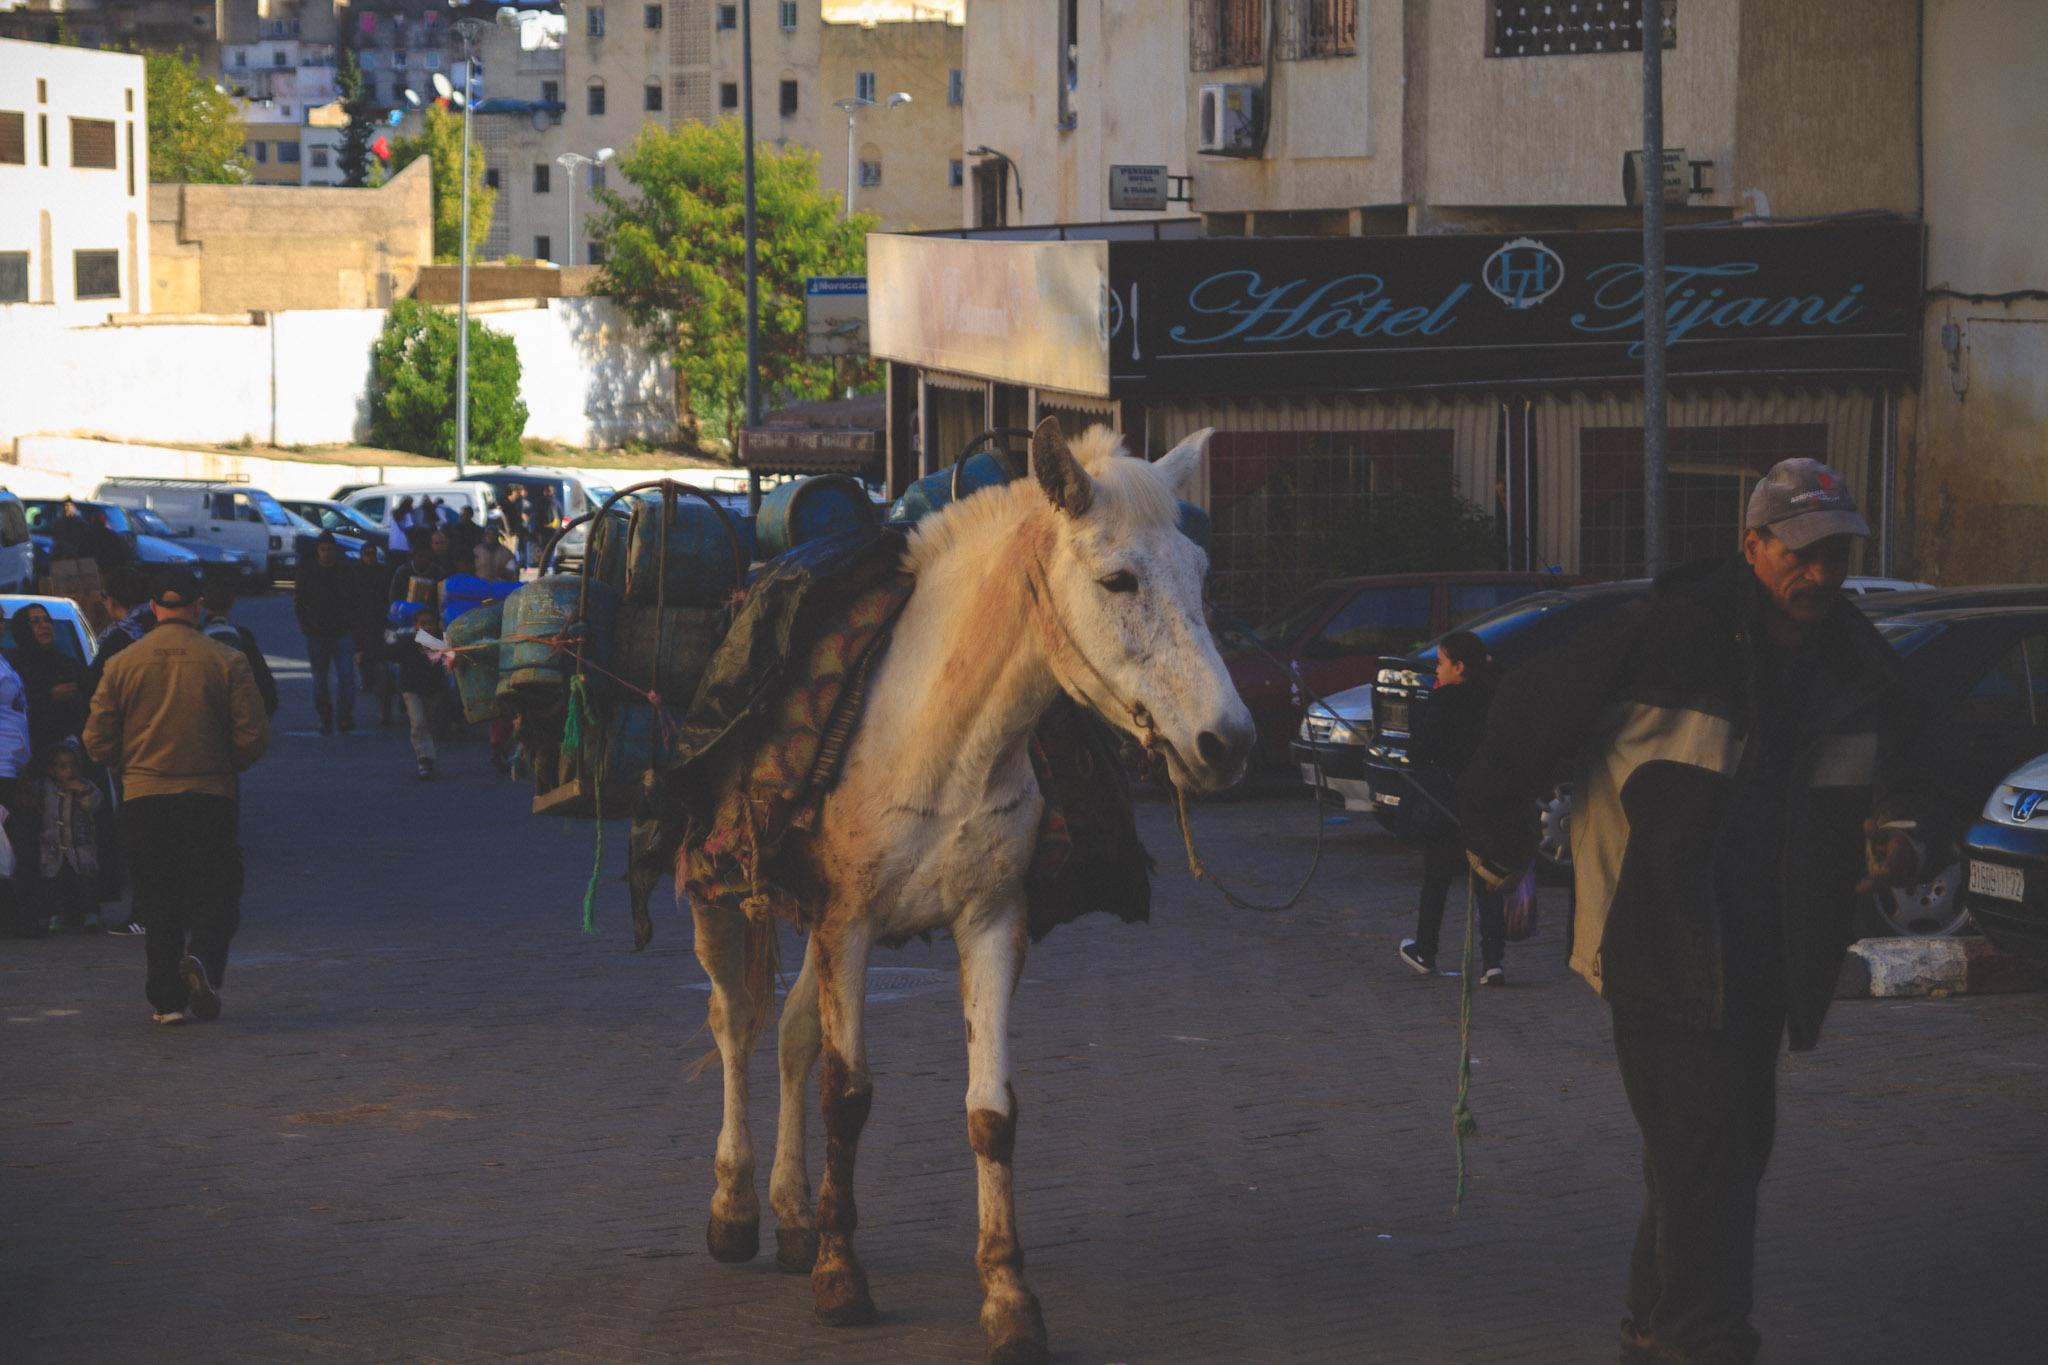 morocco_rabat_fez_casablanca_lesleyade_photography-22.jpg